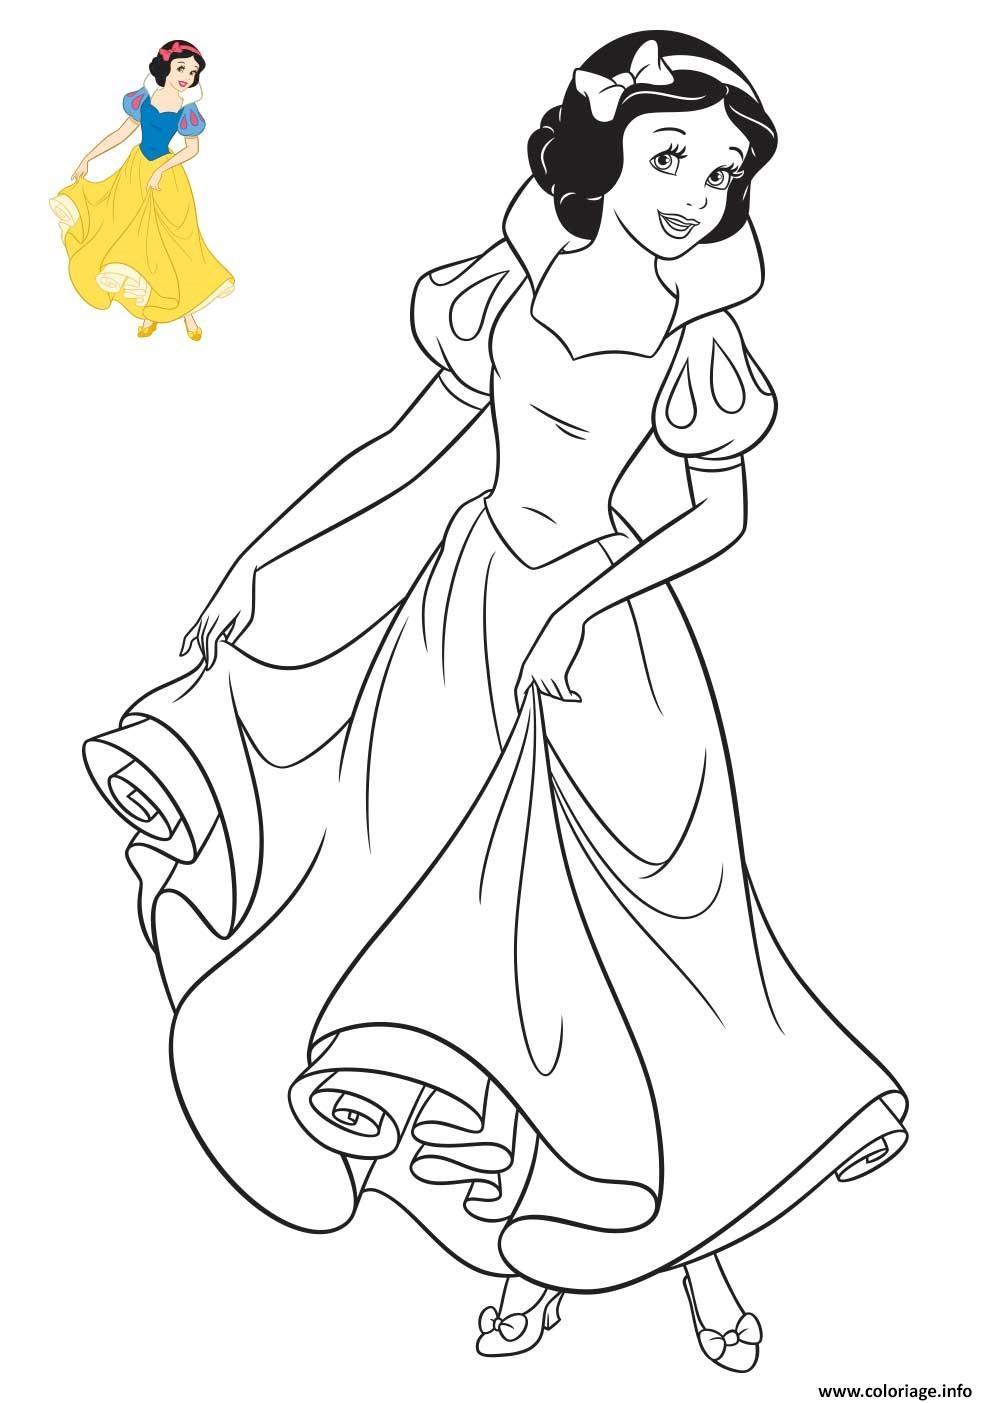 Coloriage Princesse Disney Blanche Neige Dessin